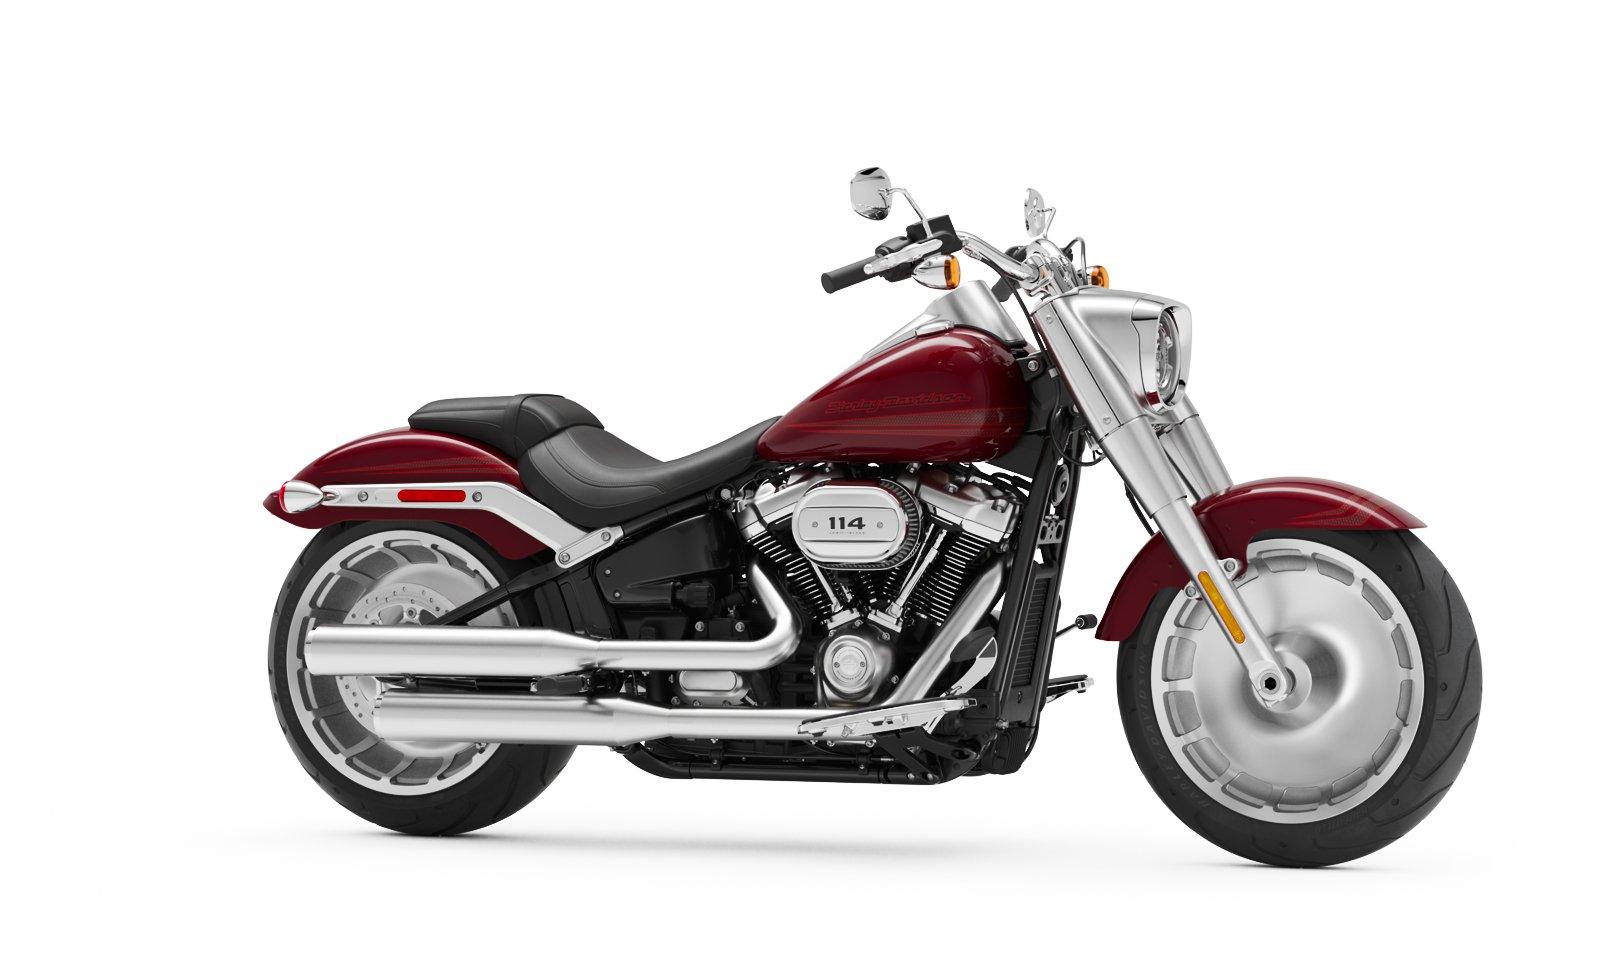 2020 Fat Boy Motorcycle Harley Davidson